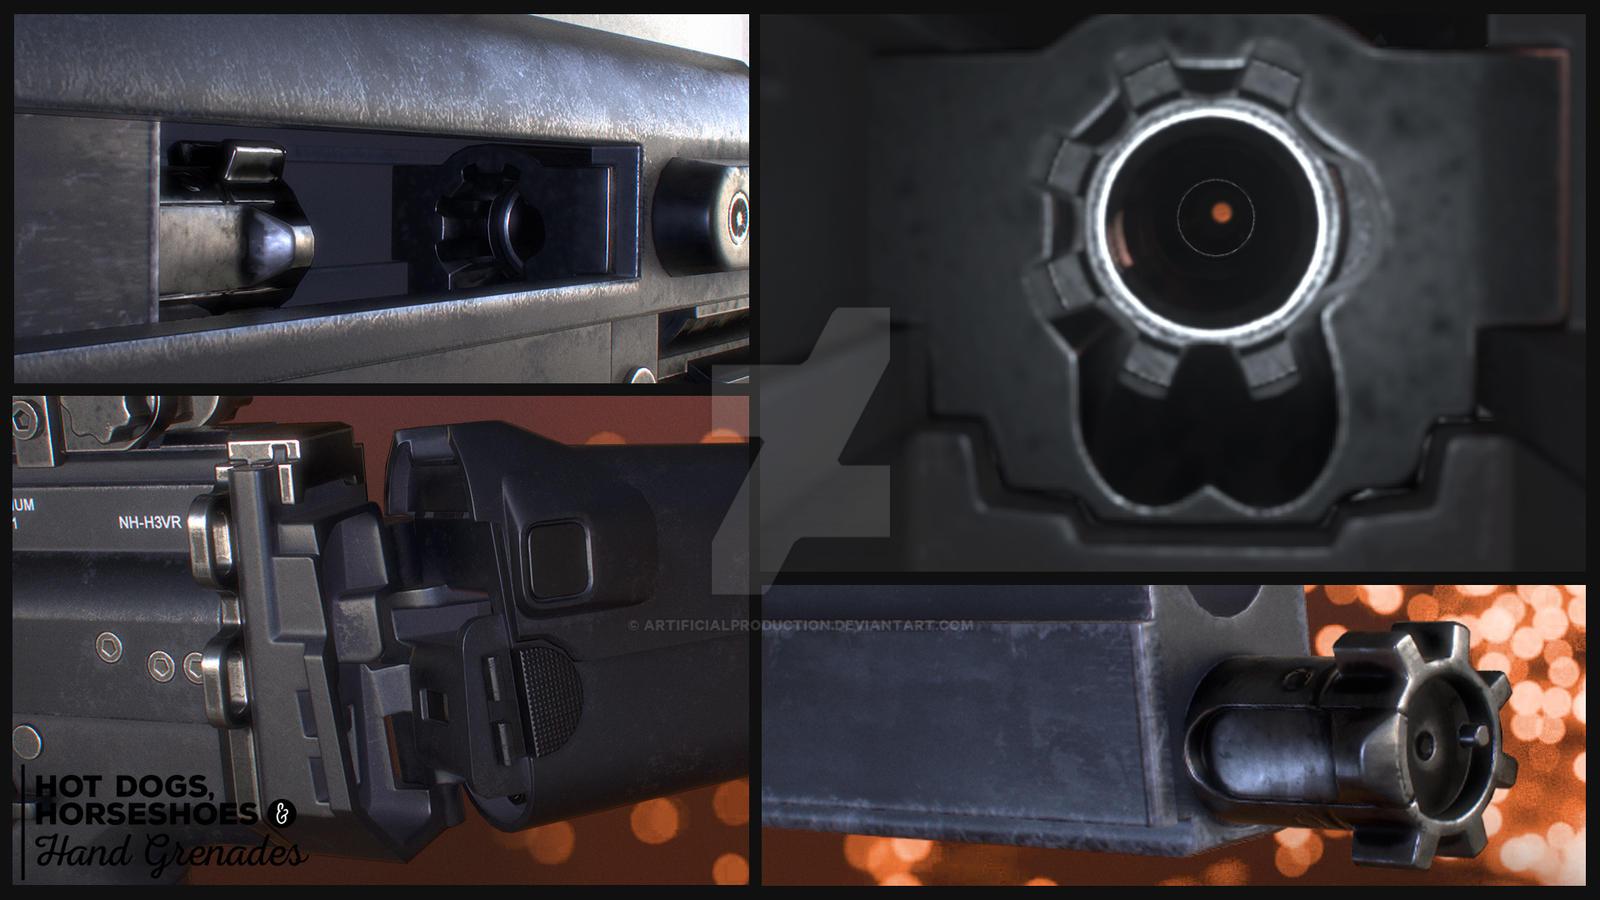 FN Scar mk17 LB detail shots by Artificialproduction